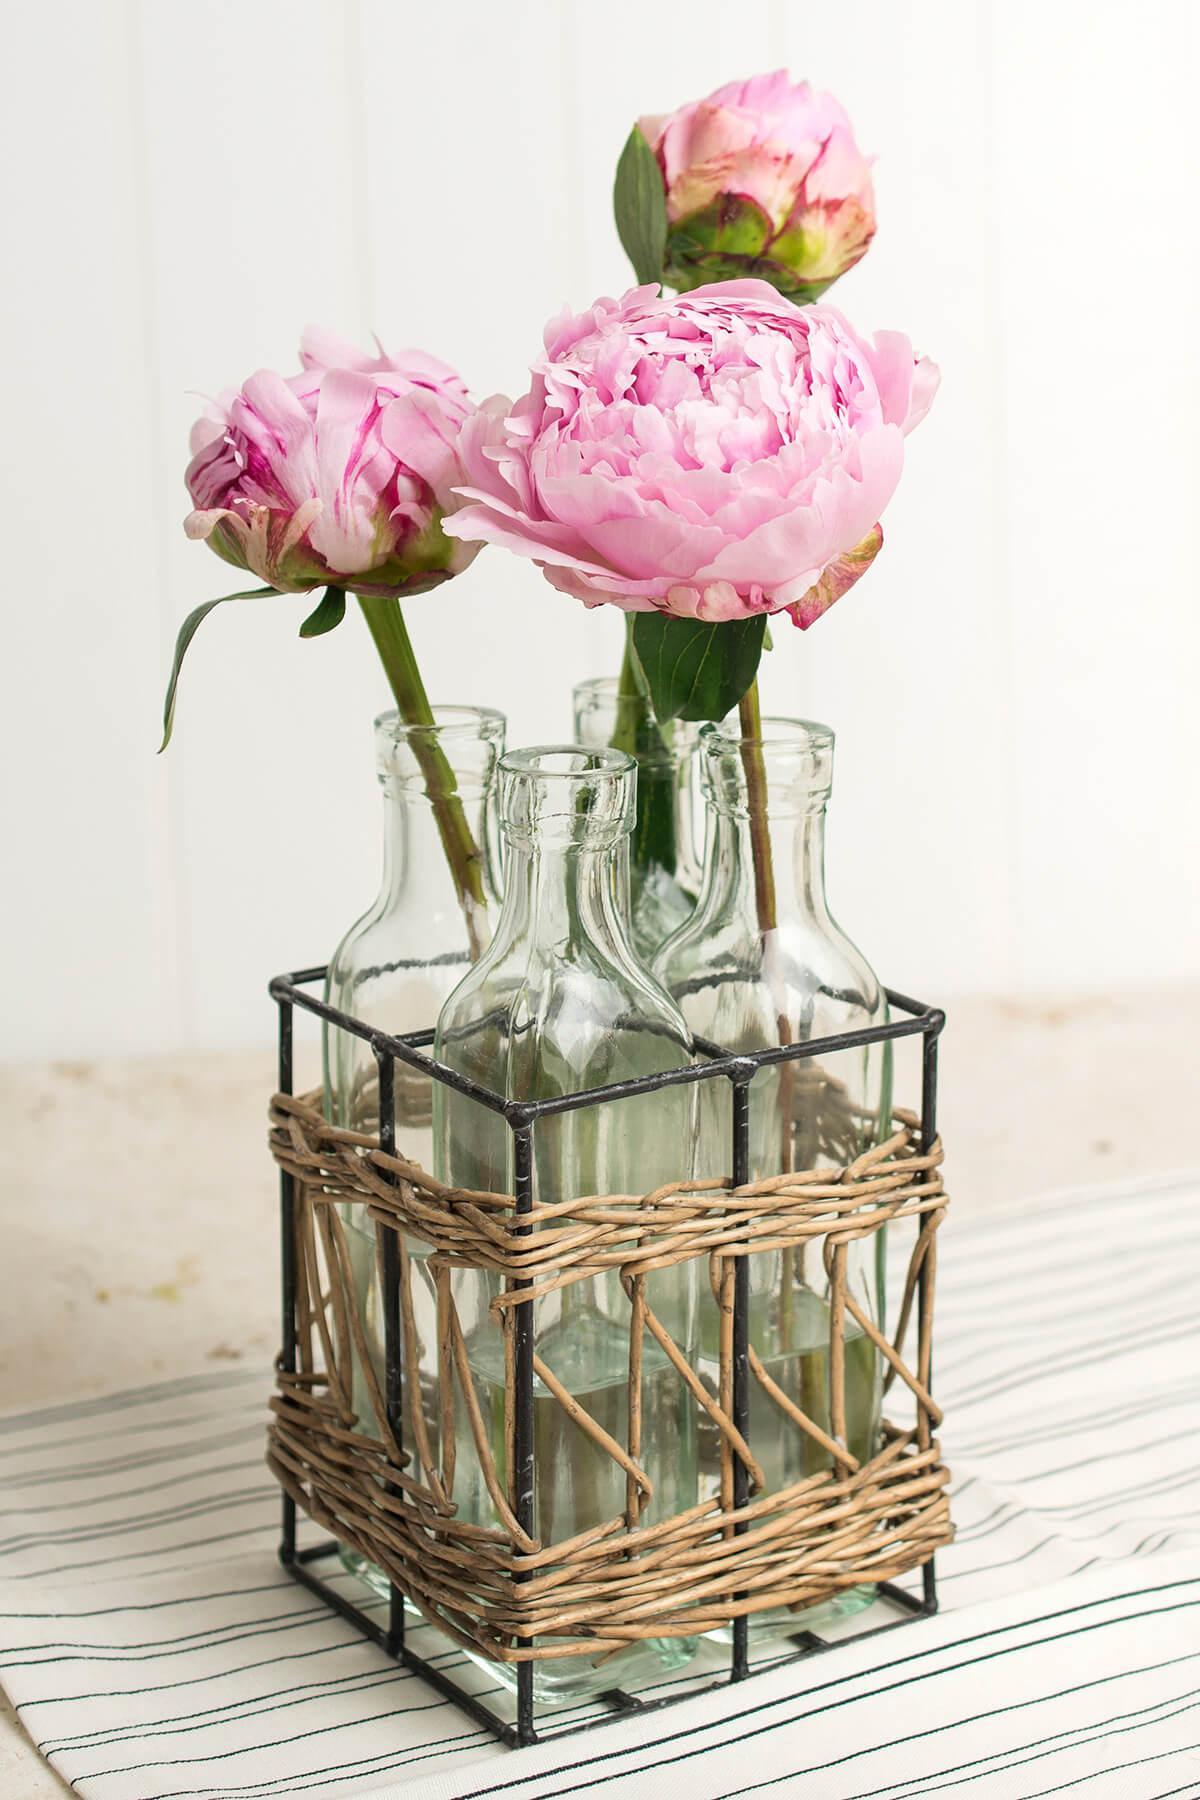 4 Glass Bottles in Willow Basket